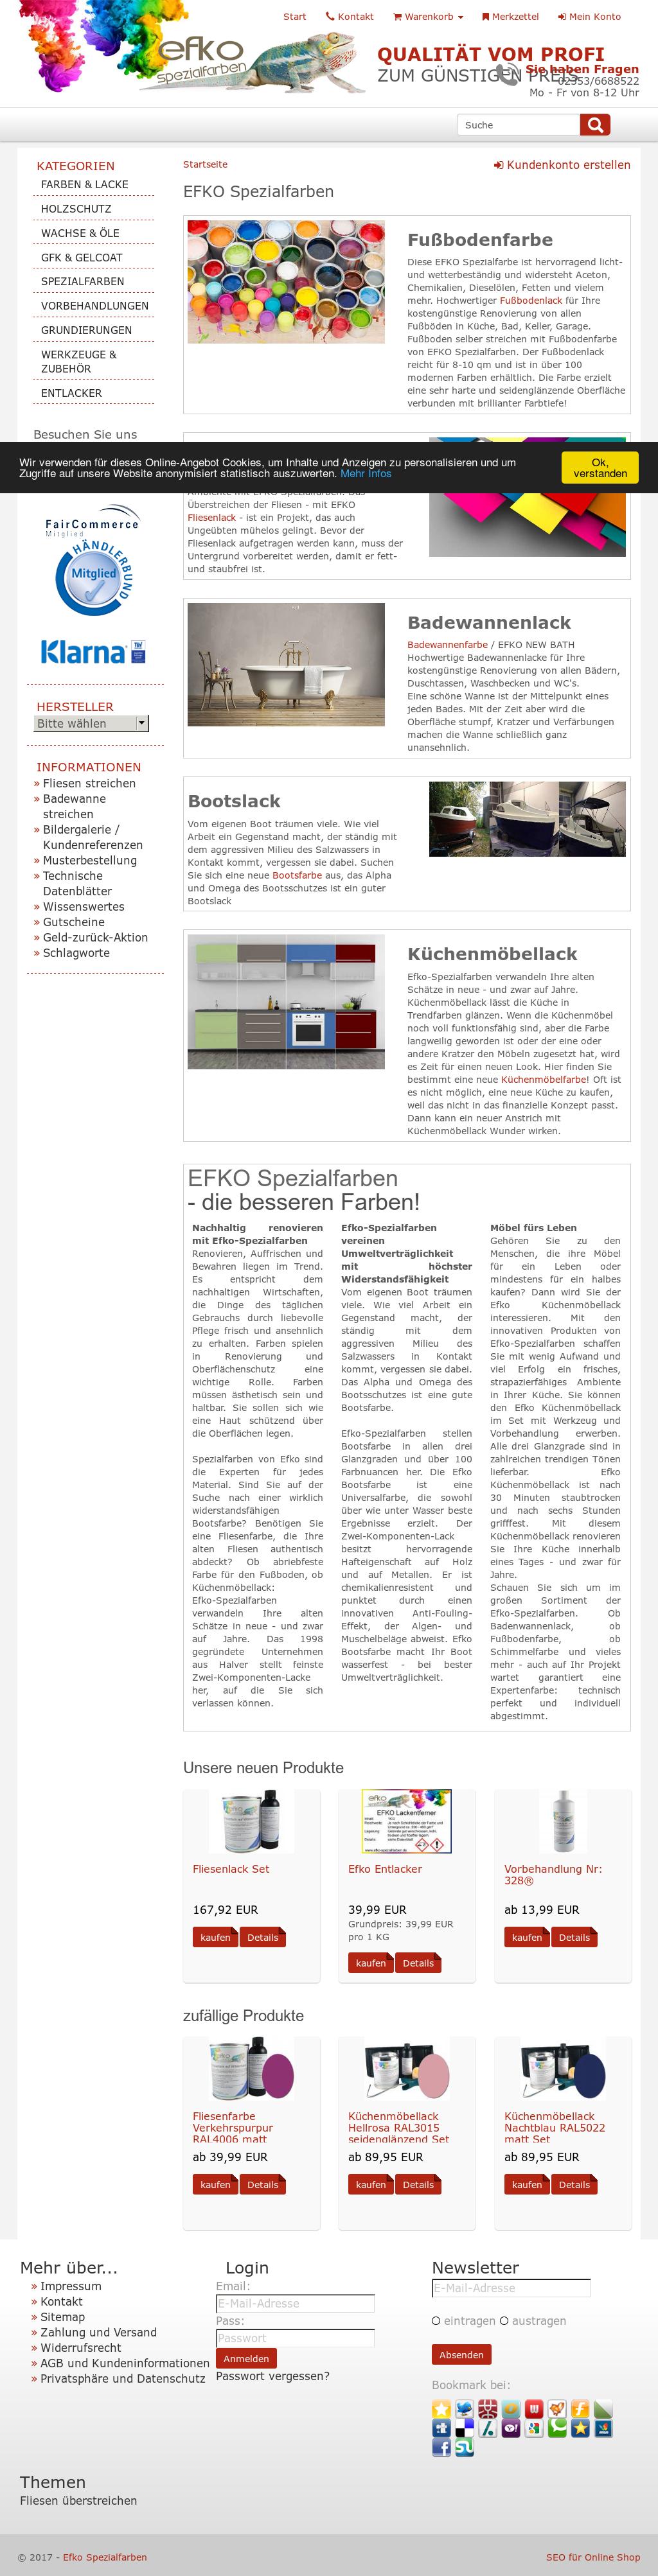 Efko Spezialfarbenu0027s Website Screenshot On May 2017